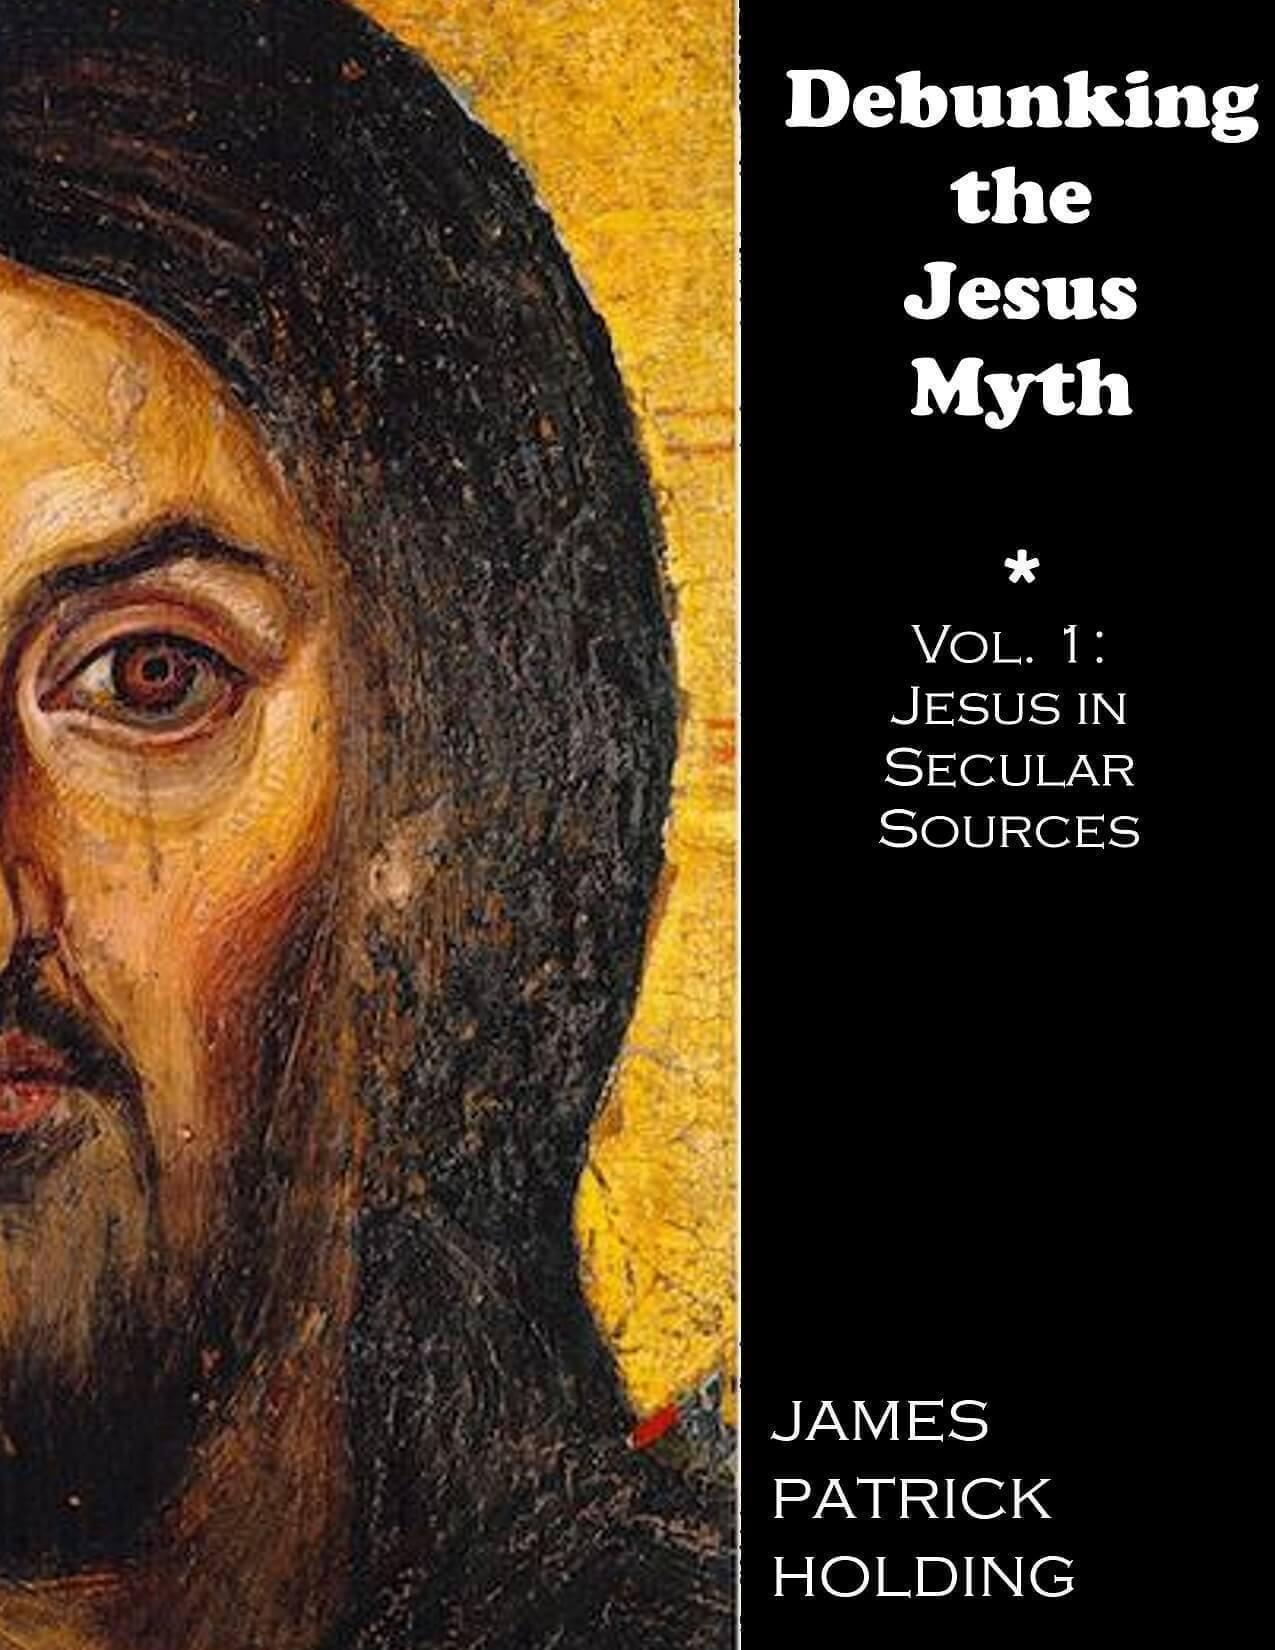 Debunking the Jesus Myth Part 1: the Pagan Copycat Theory - James Patrick Holding